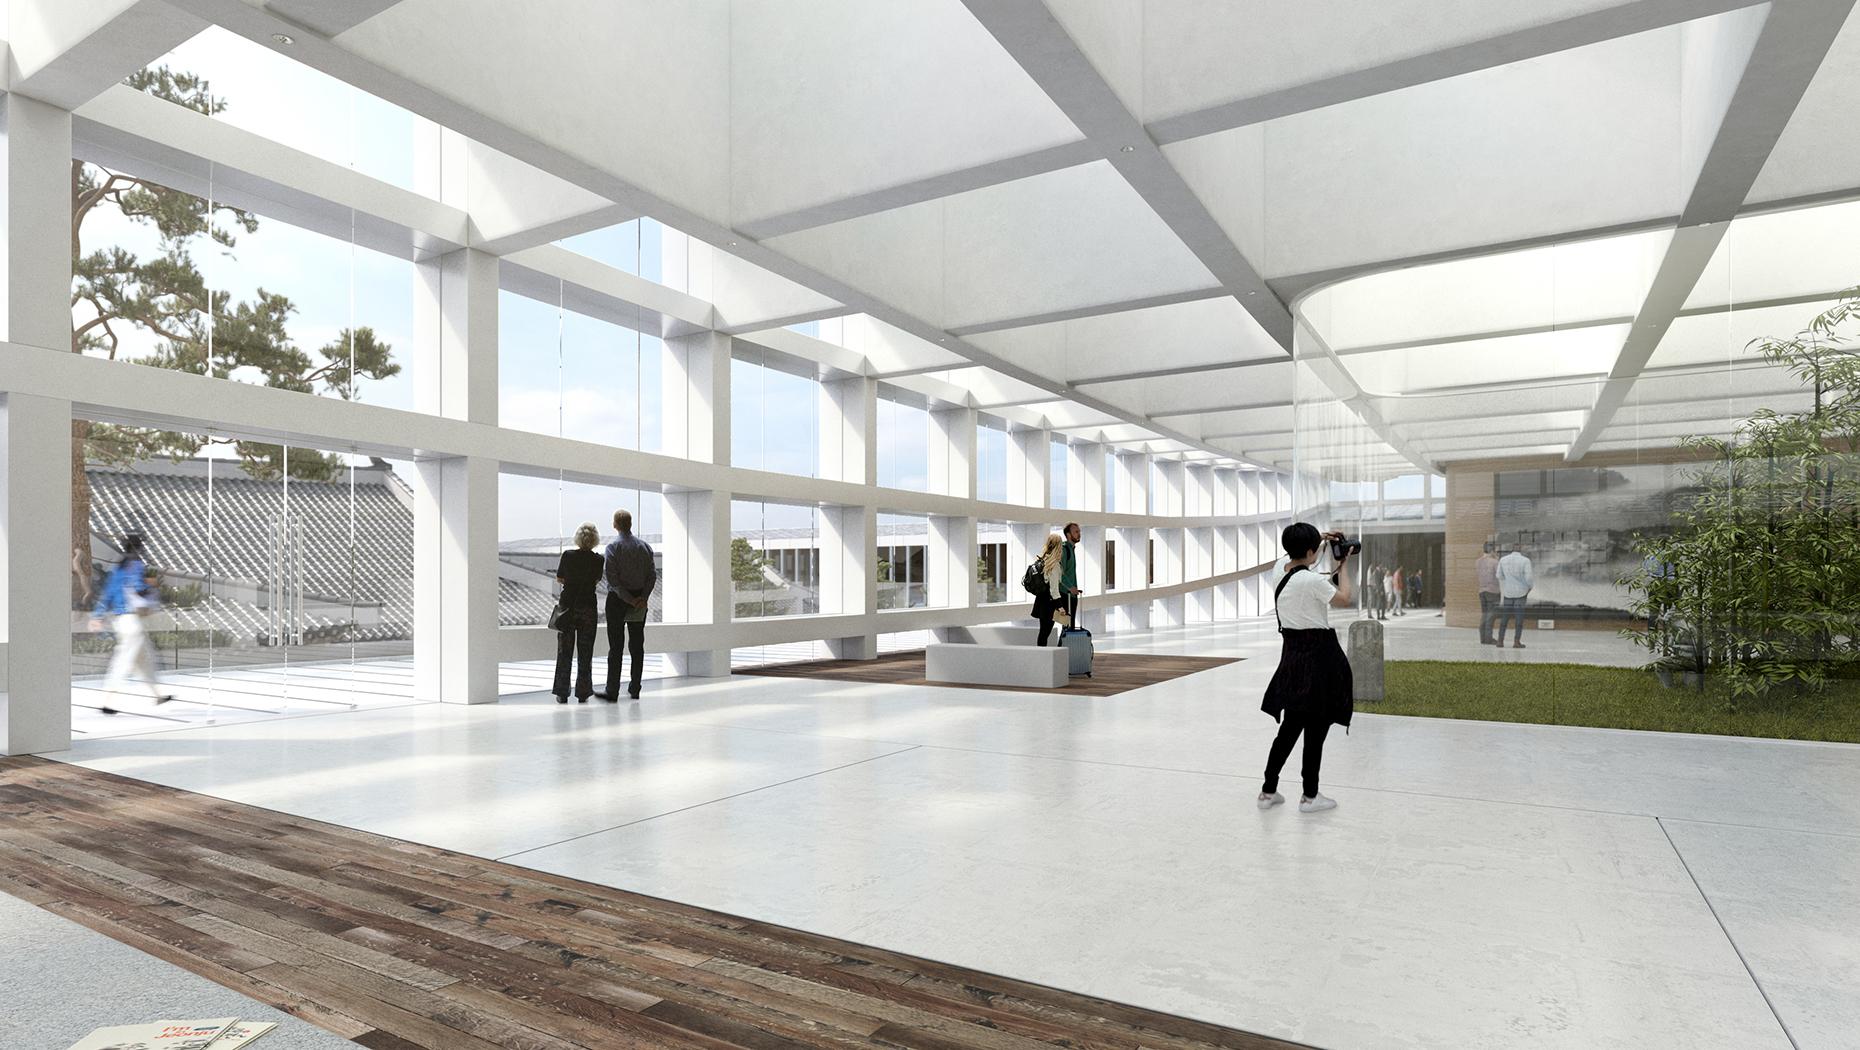 20190909 Jeonju Station Concourse Perspective Final